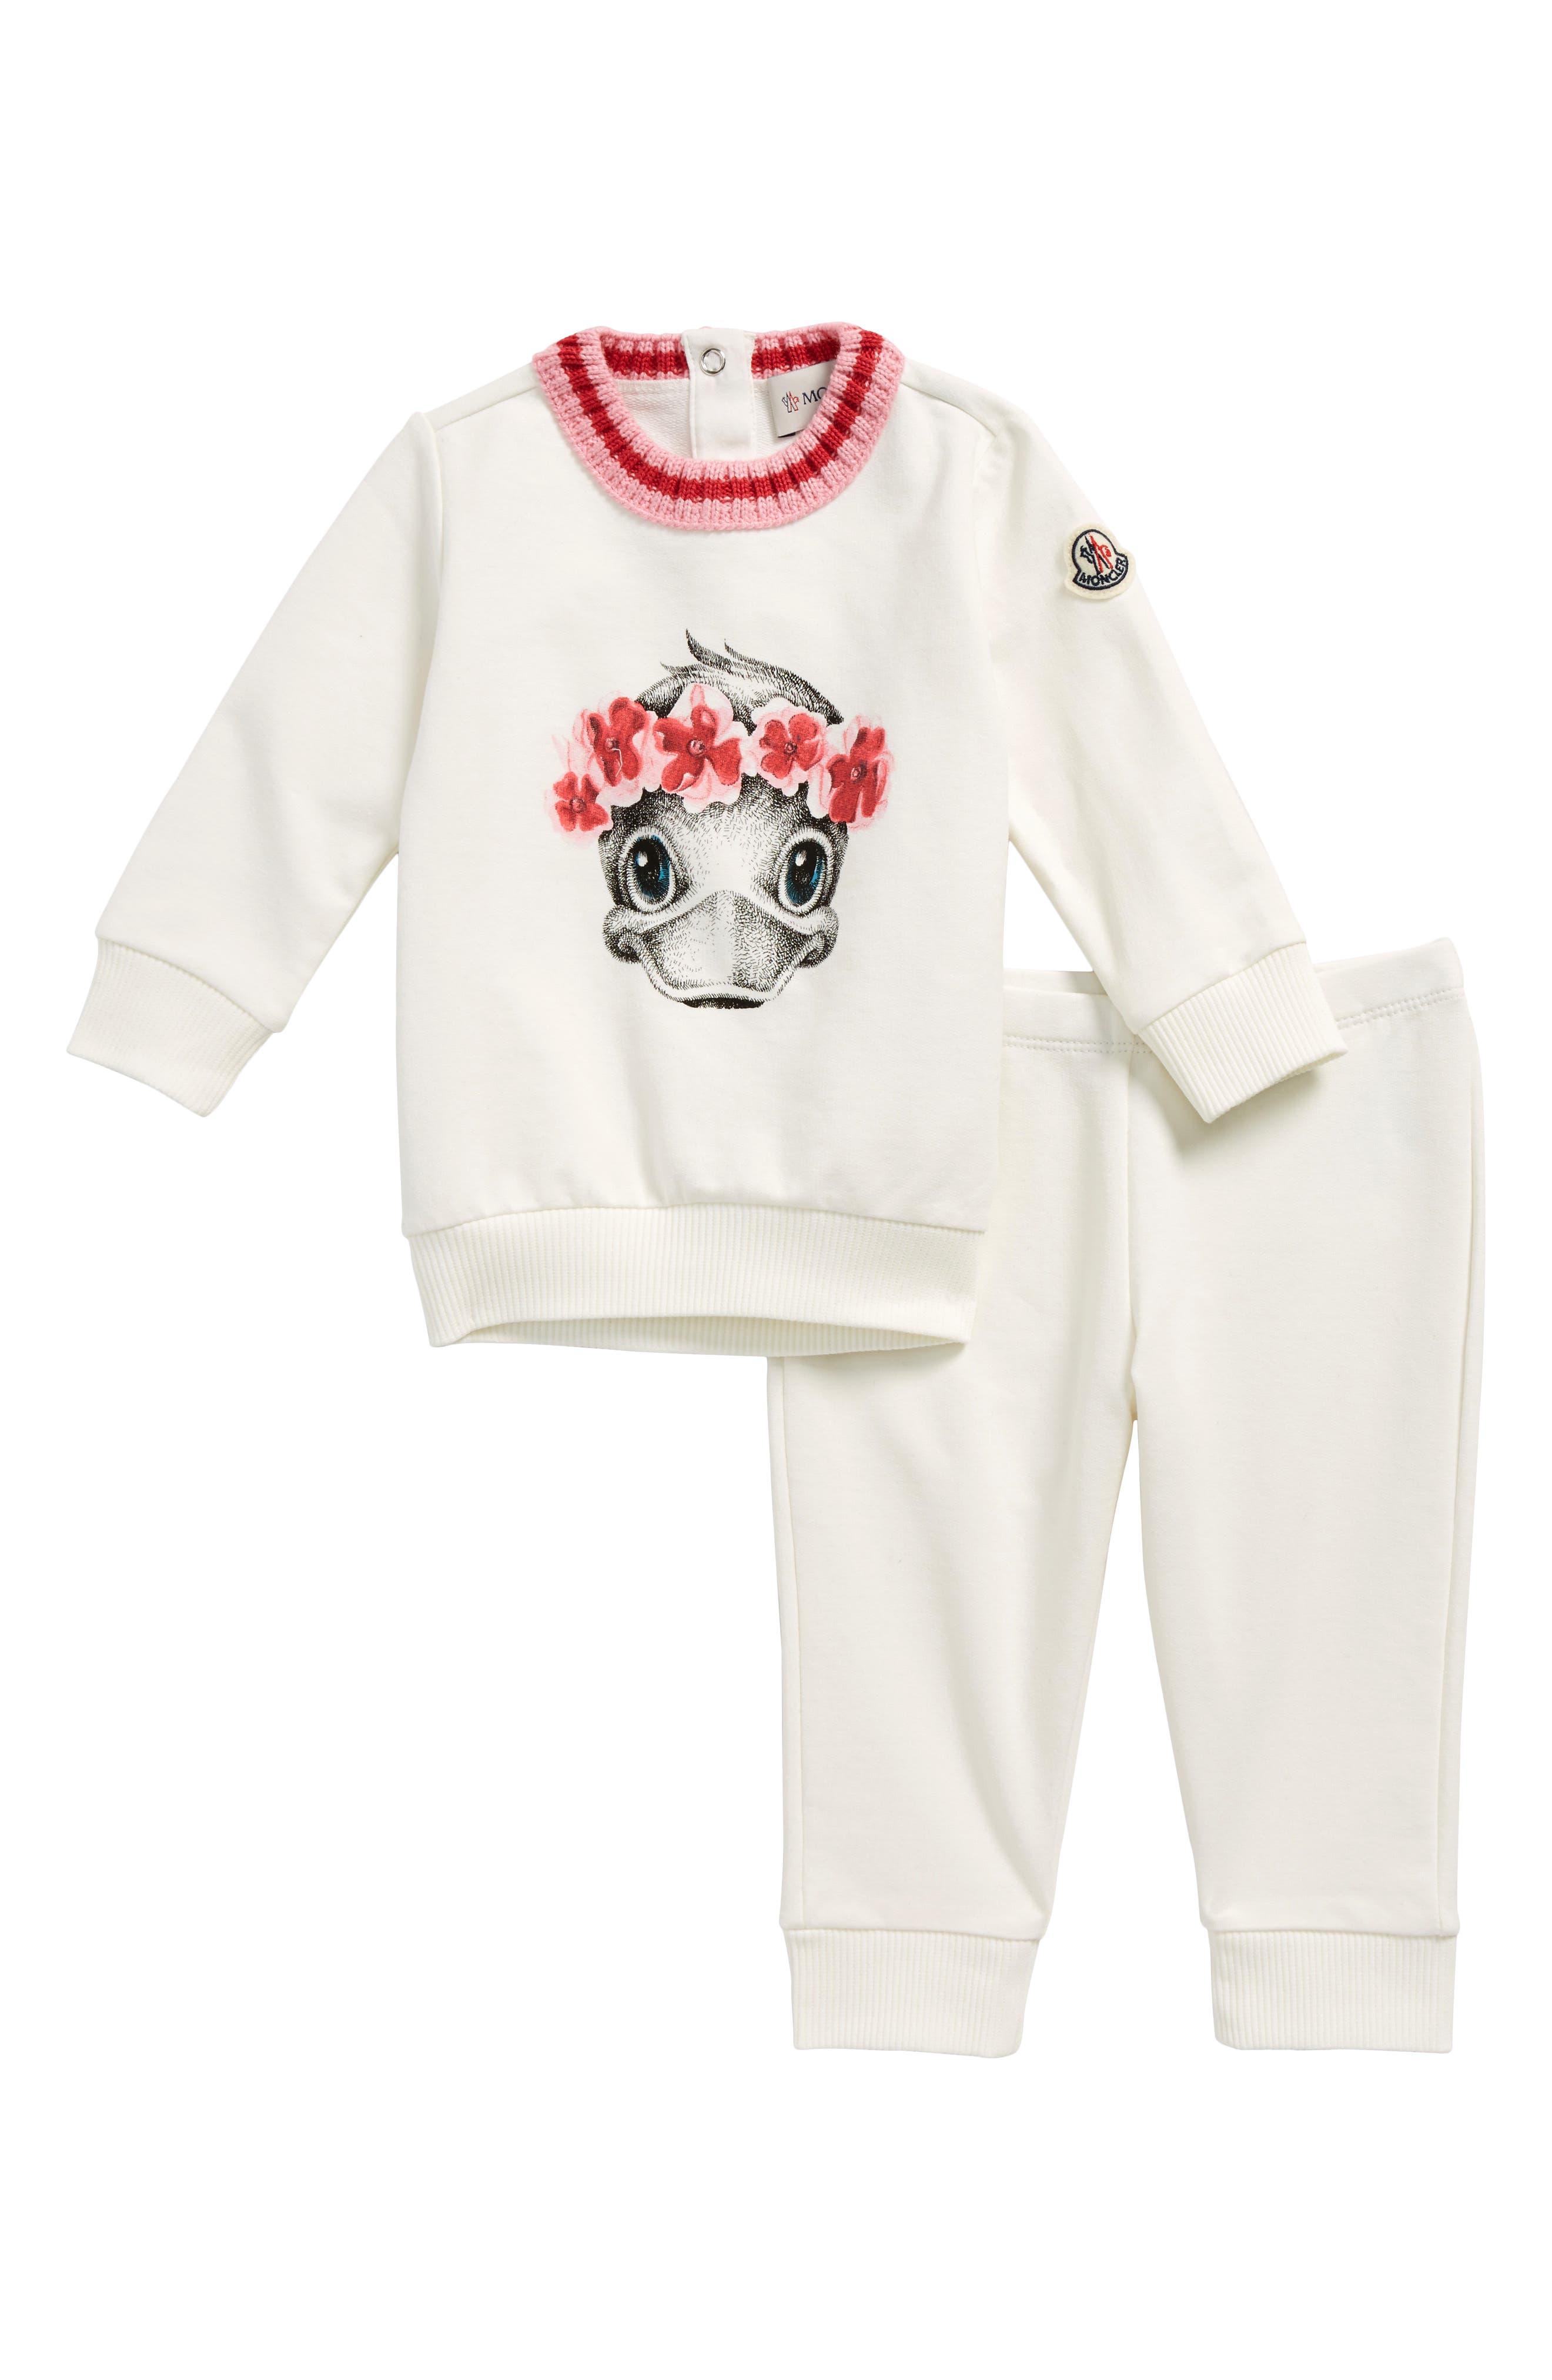 Main Image - Moncler Duck Print Sweater & Pants Set (Baby Girls)